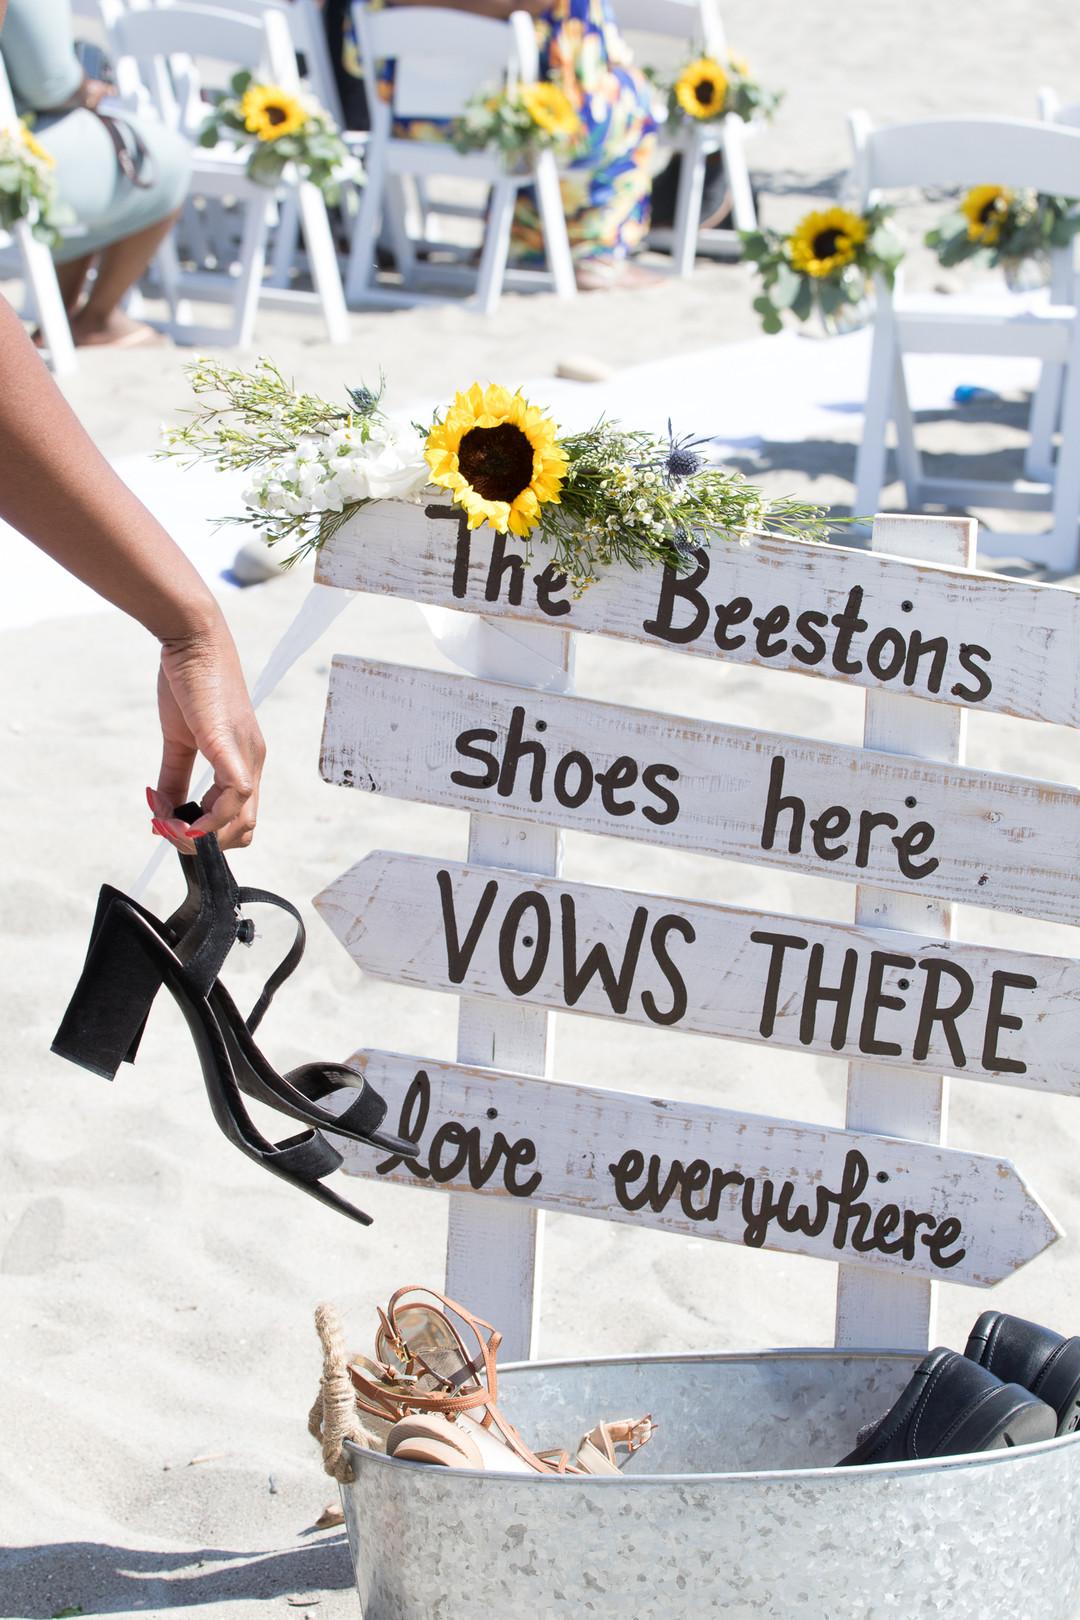 www.santabarbarawedding.com | Renoda Campbell | Weddings by Bobbie | Ventana Grill Events | Ceremony Signage